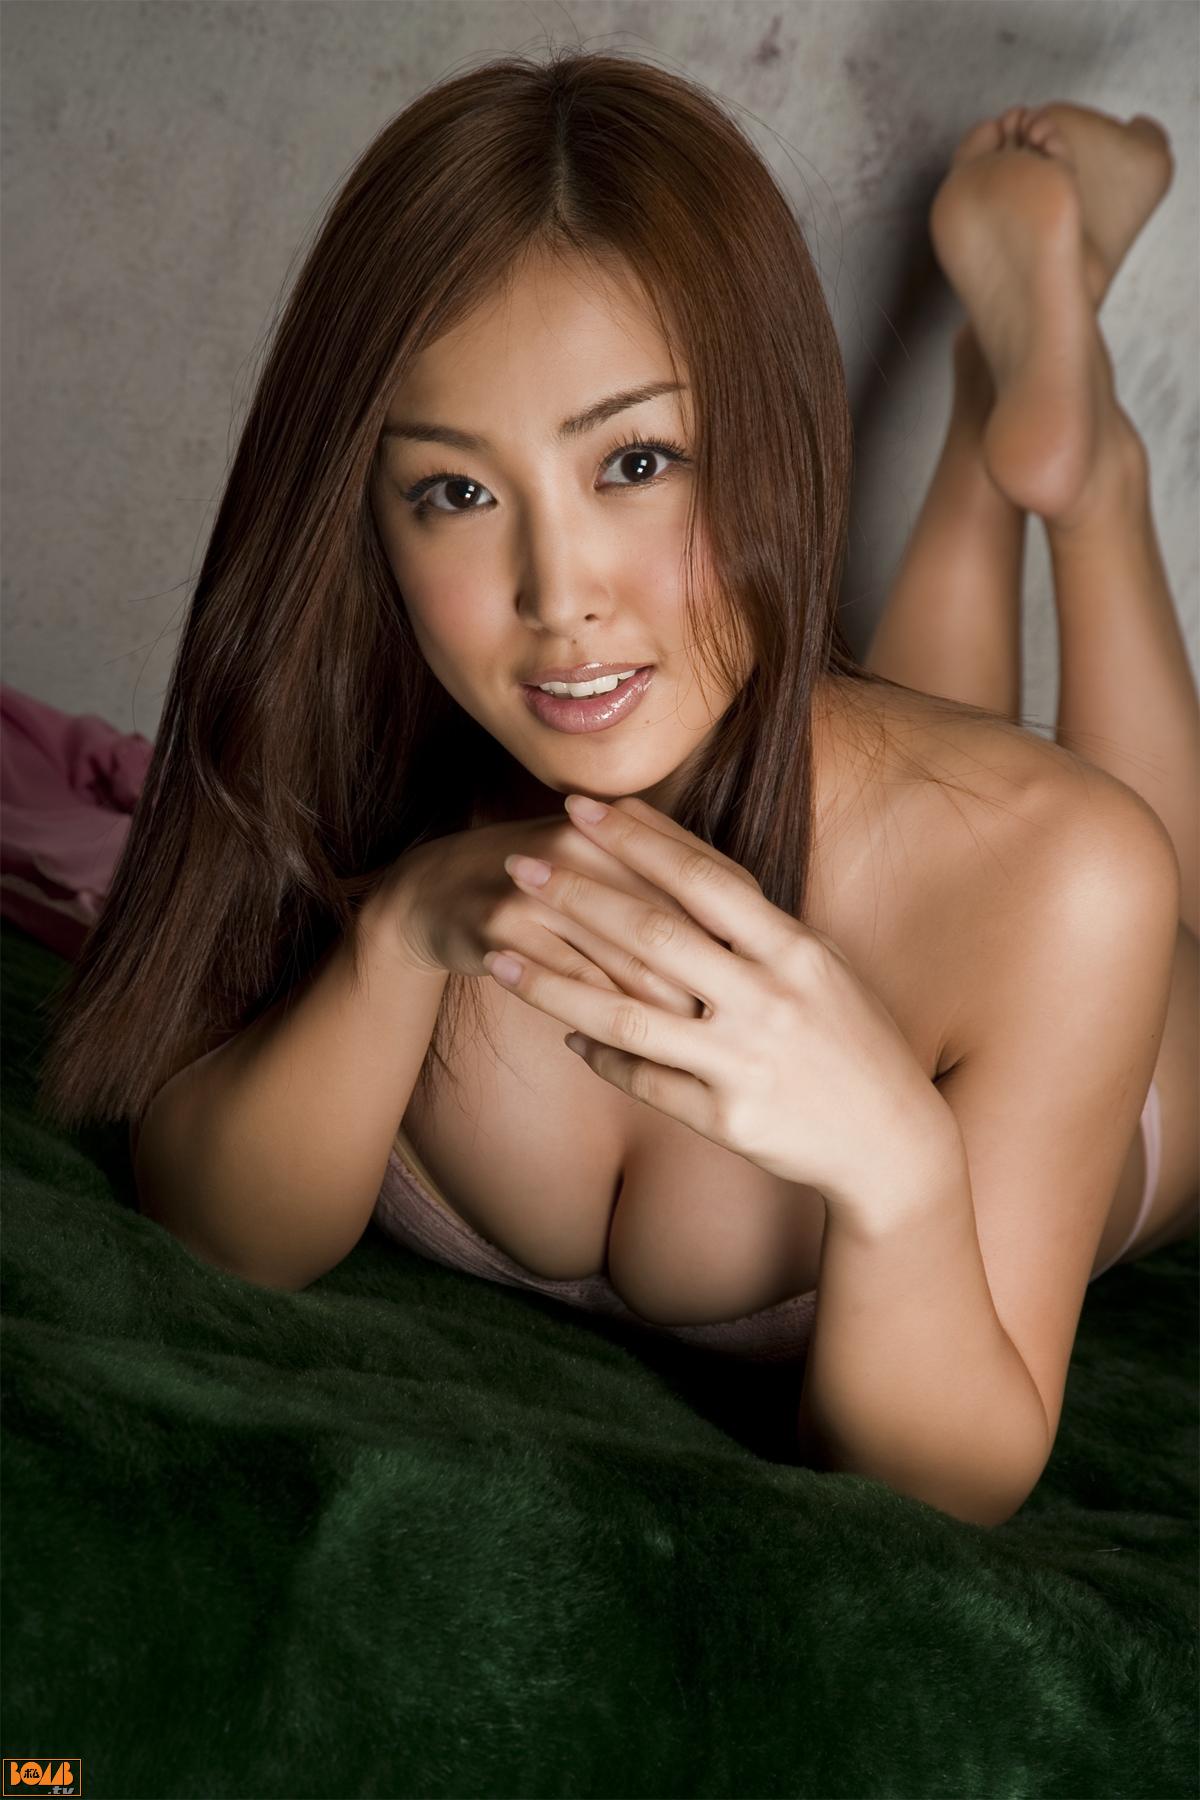 http://pics.wikifeet.com/Minase-Yashiro-Feet-305294.jpg